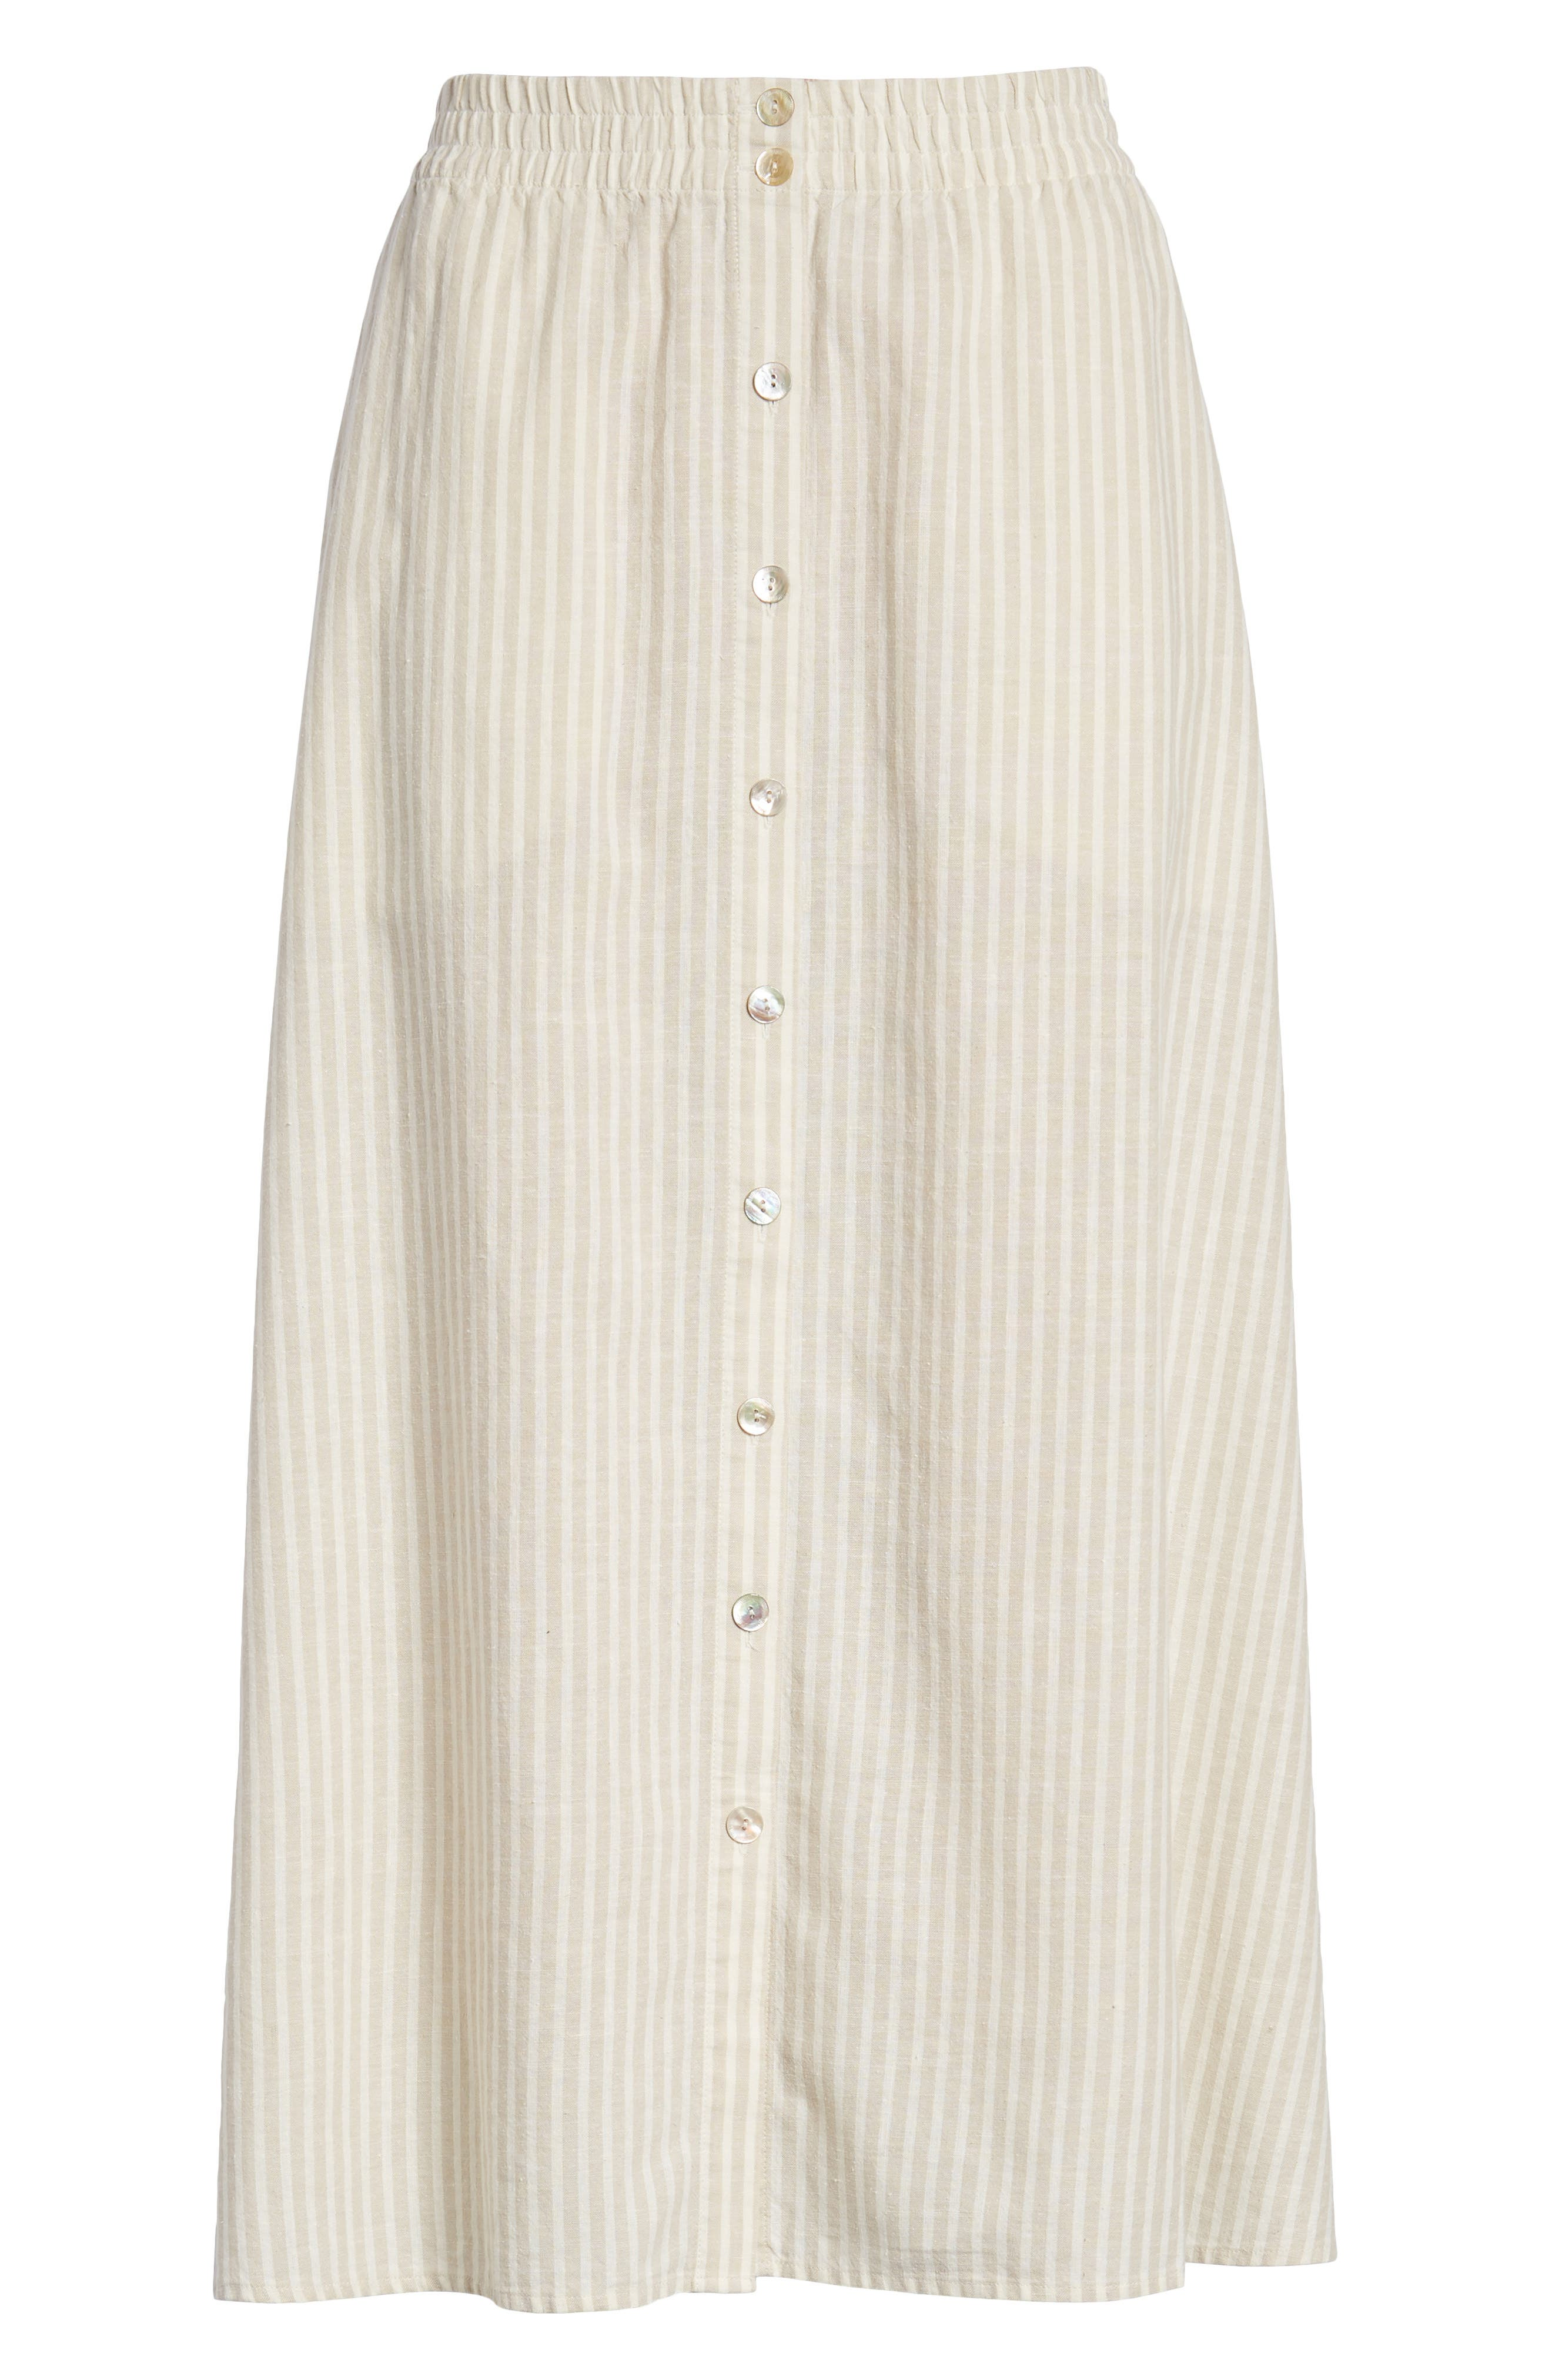 EILEEN FISHER,                             Stripe Hemp & Organic Cotton Midi Skirt,                             Alternate thumbnail 6, color,                             257